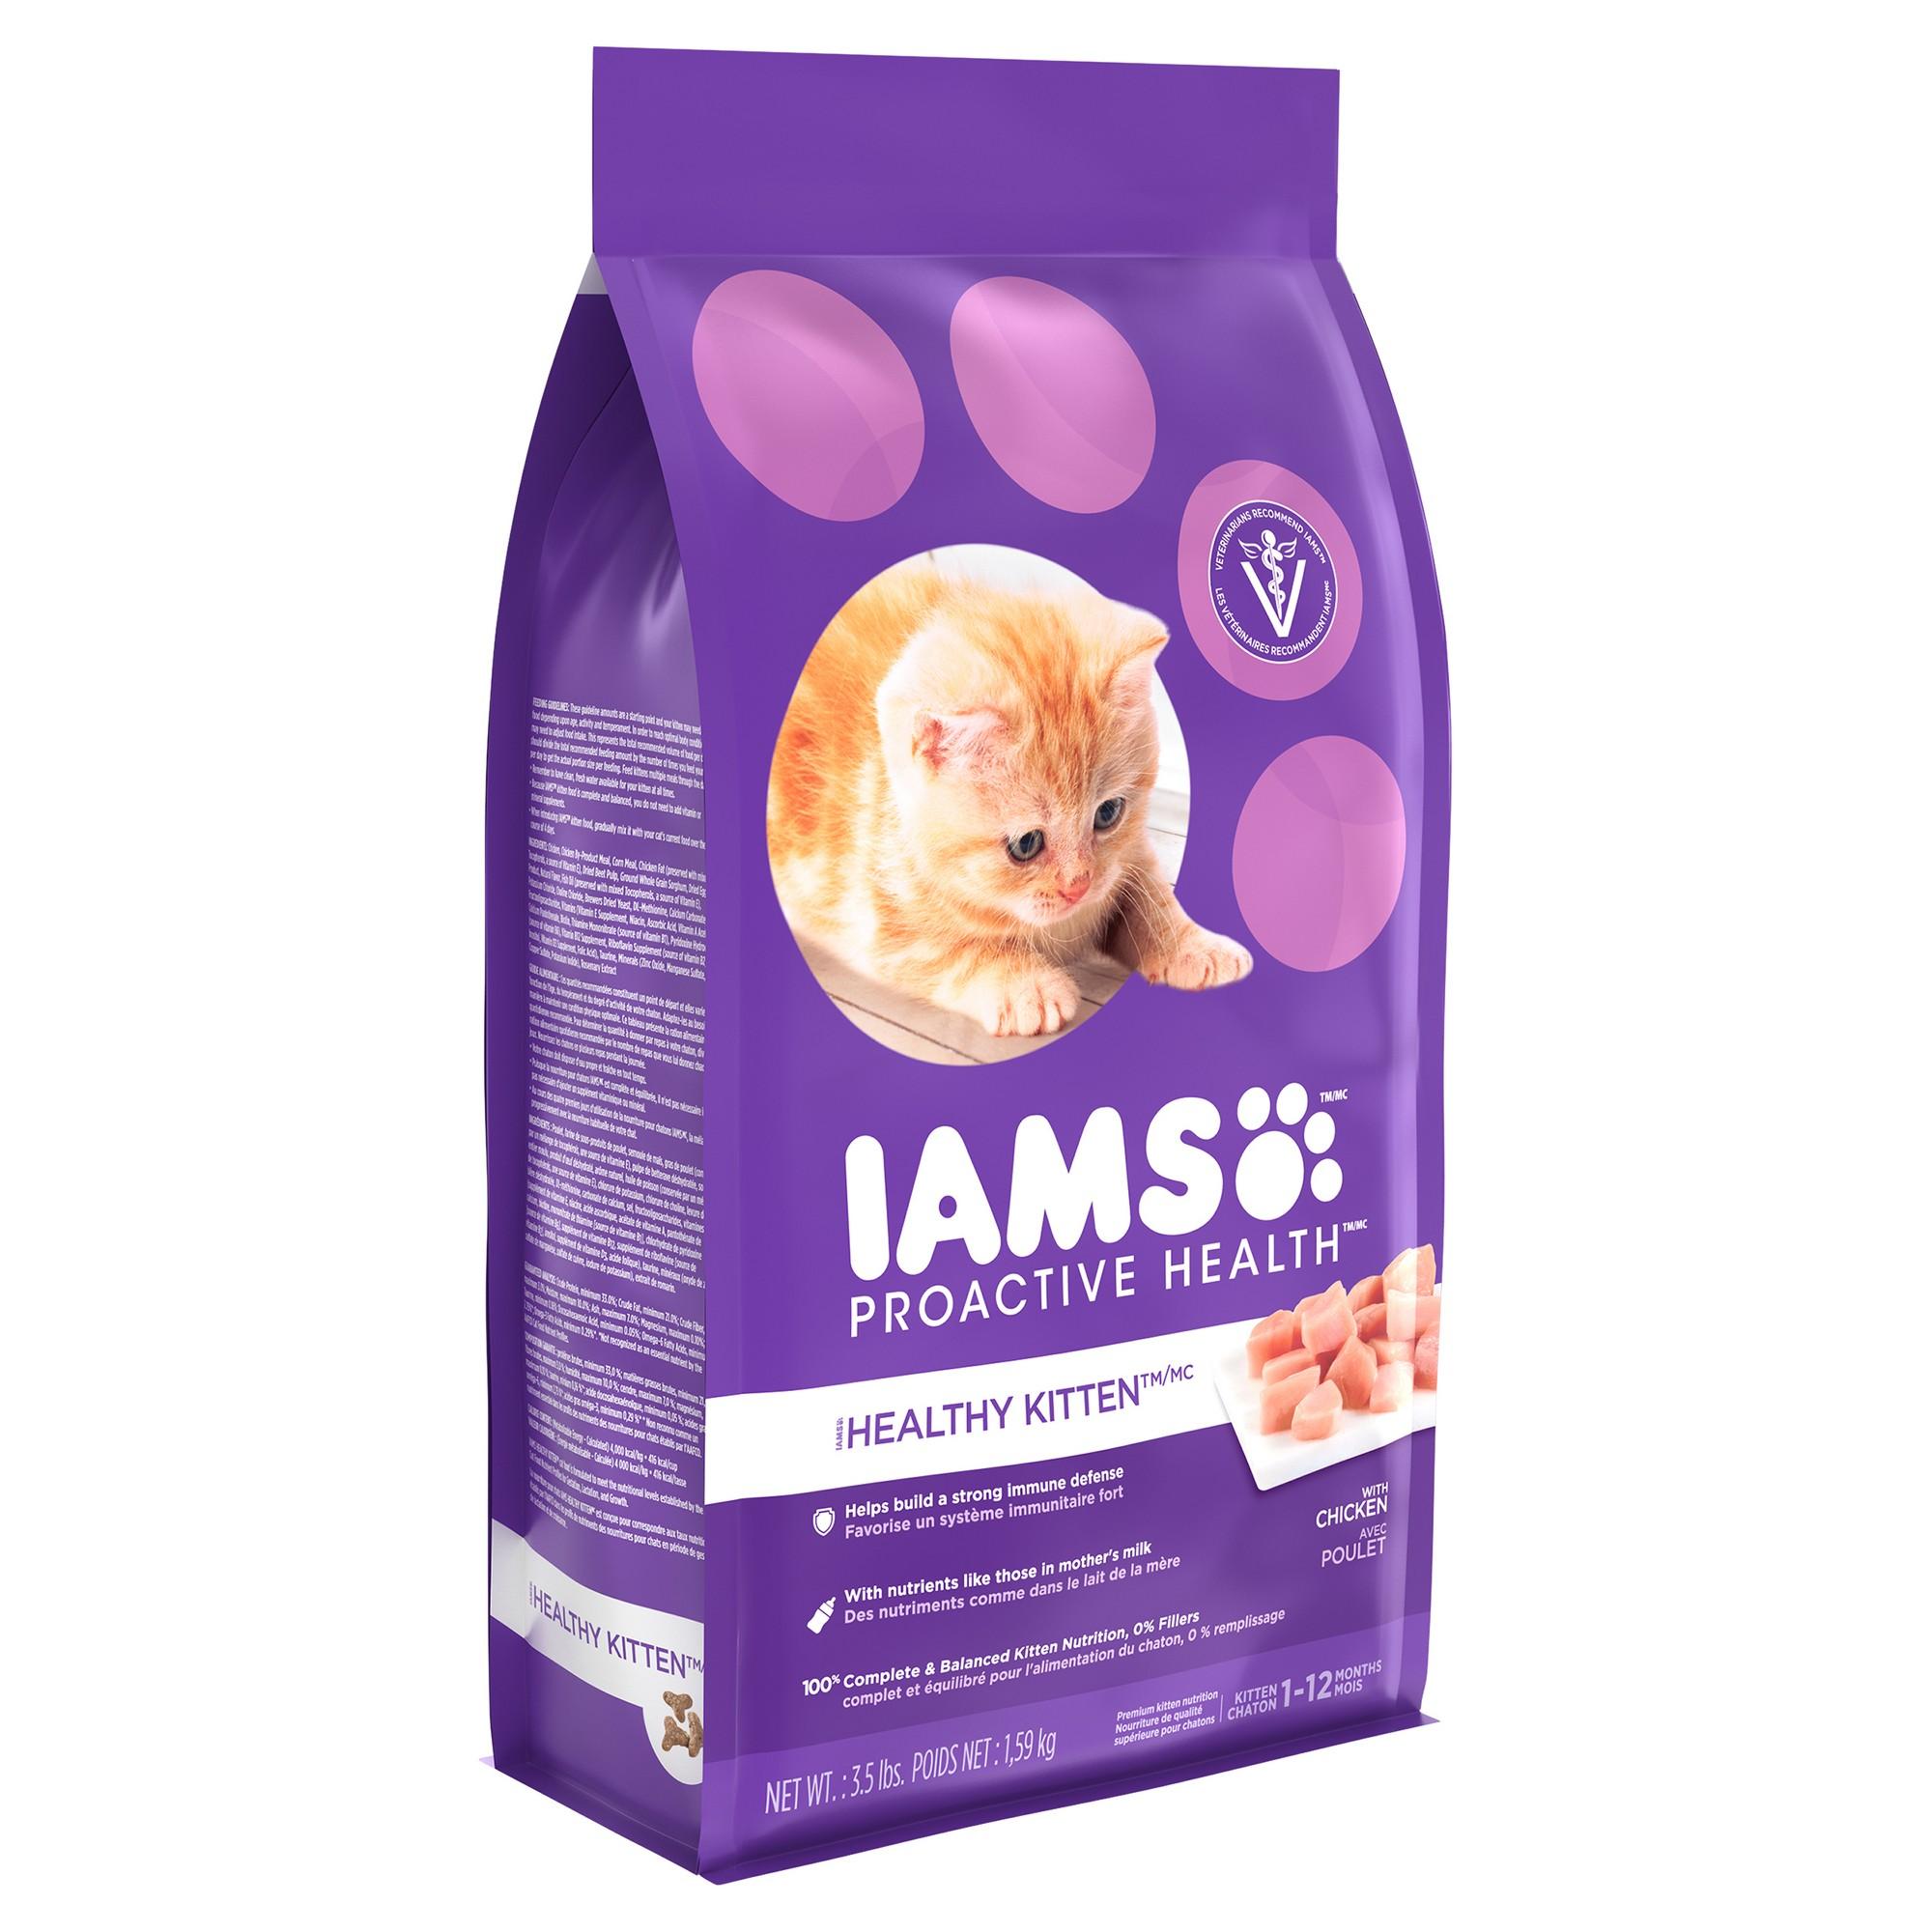 Iams Proactive Health Kitten Wet Cat Food 3.5lbs